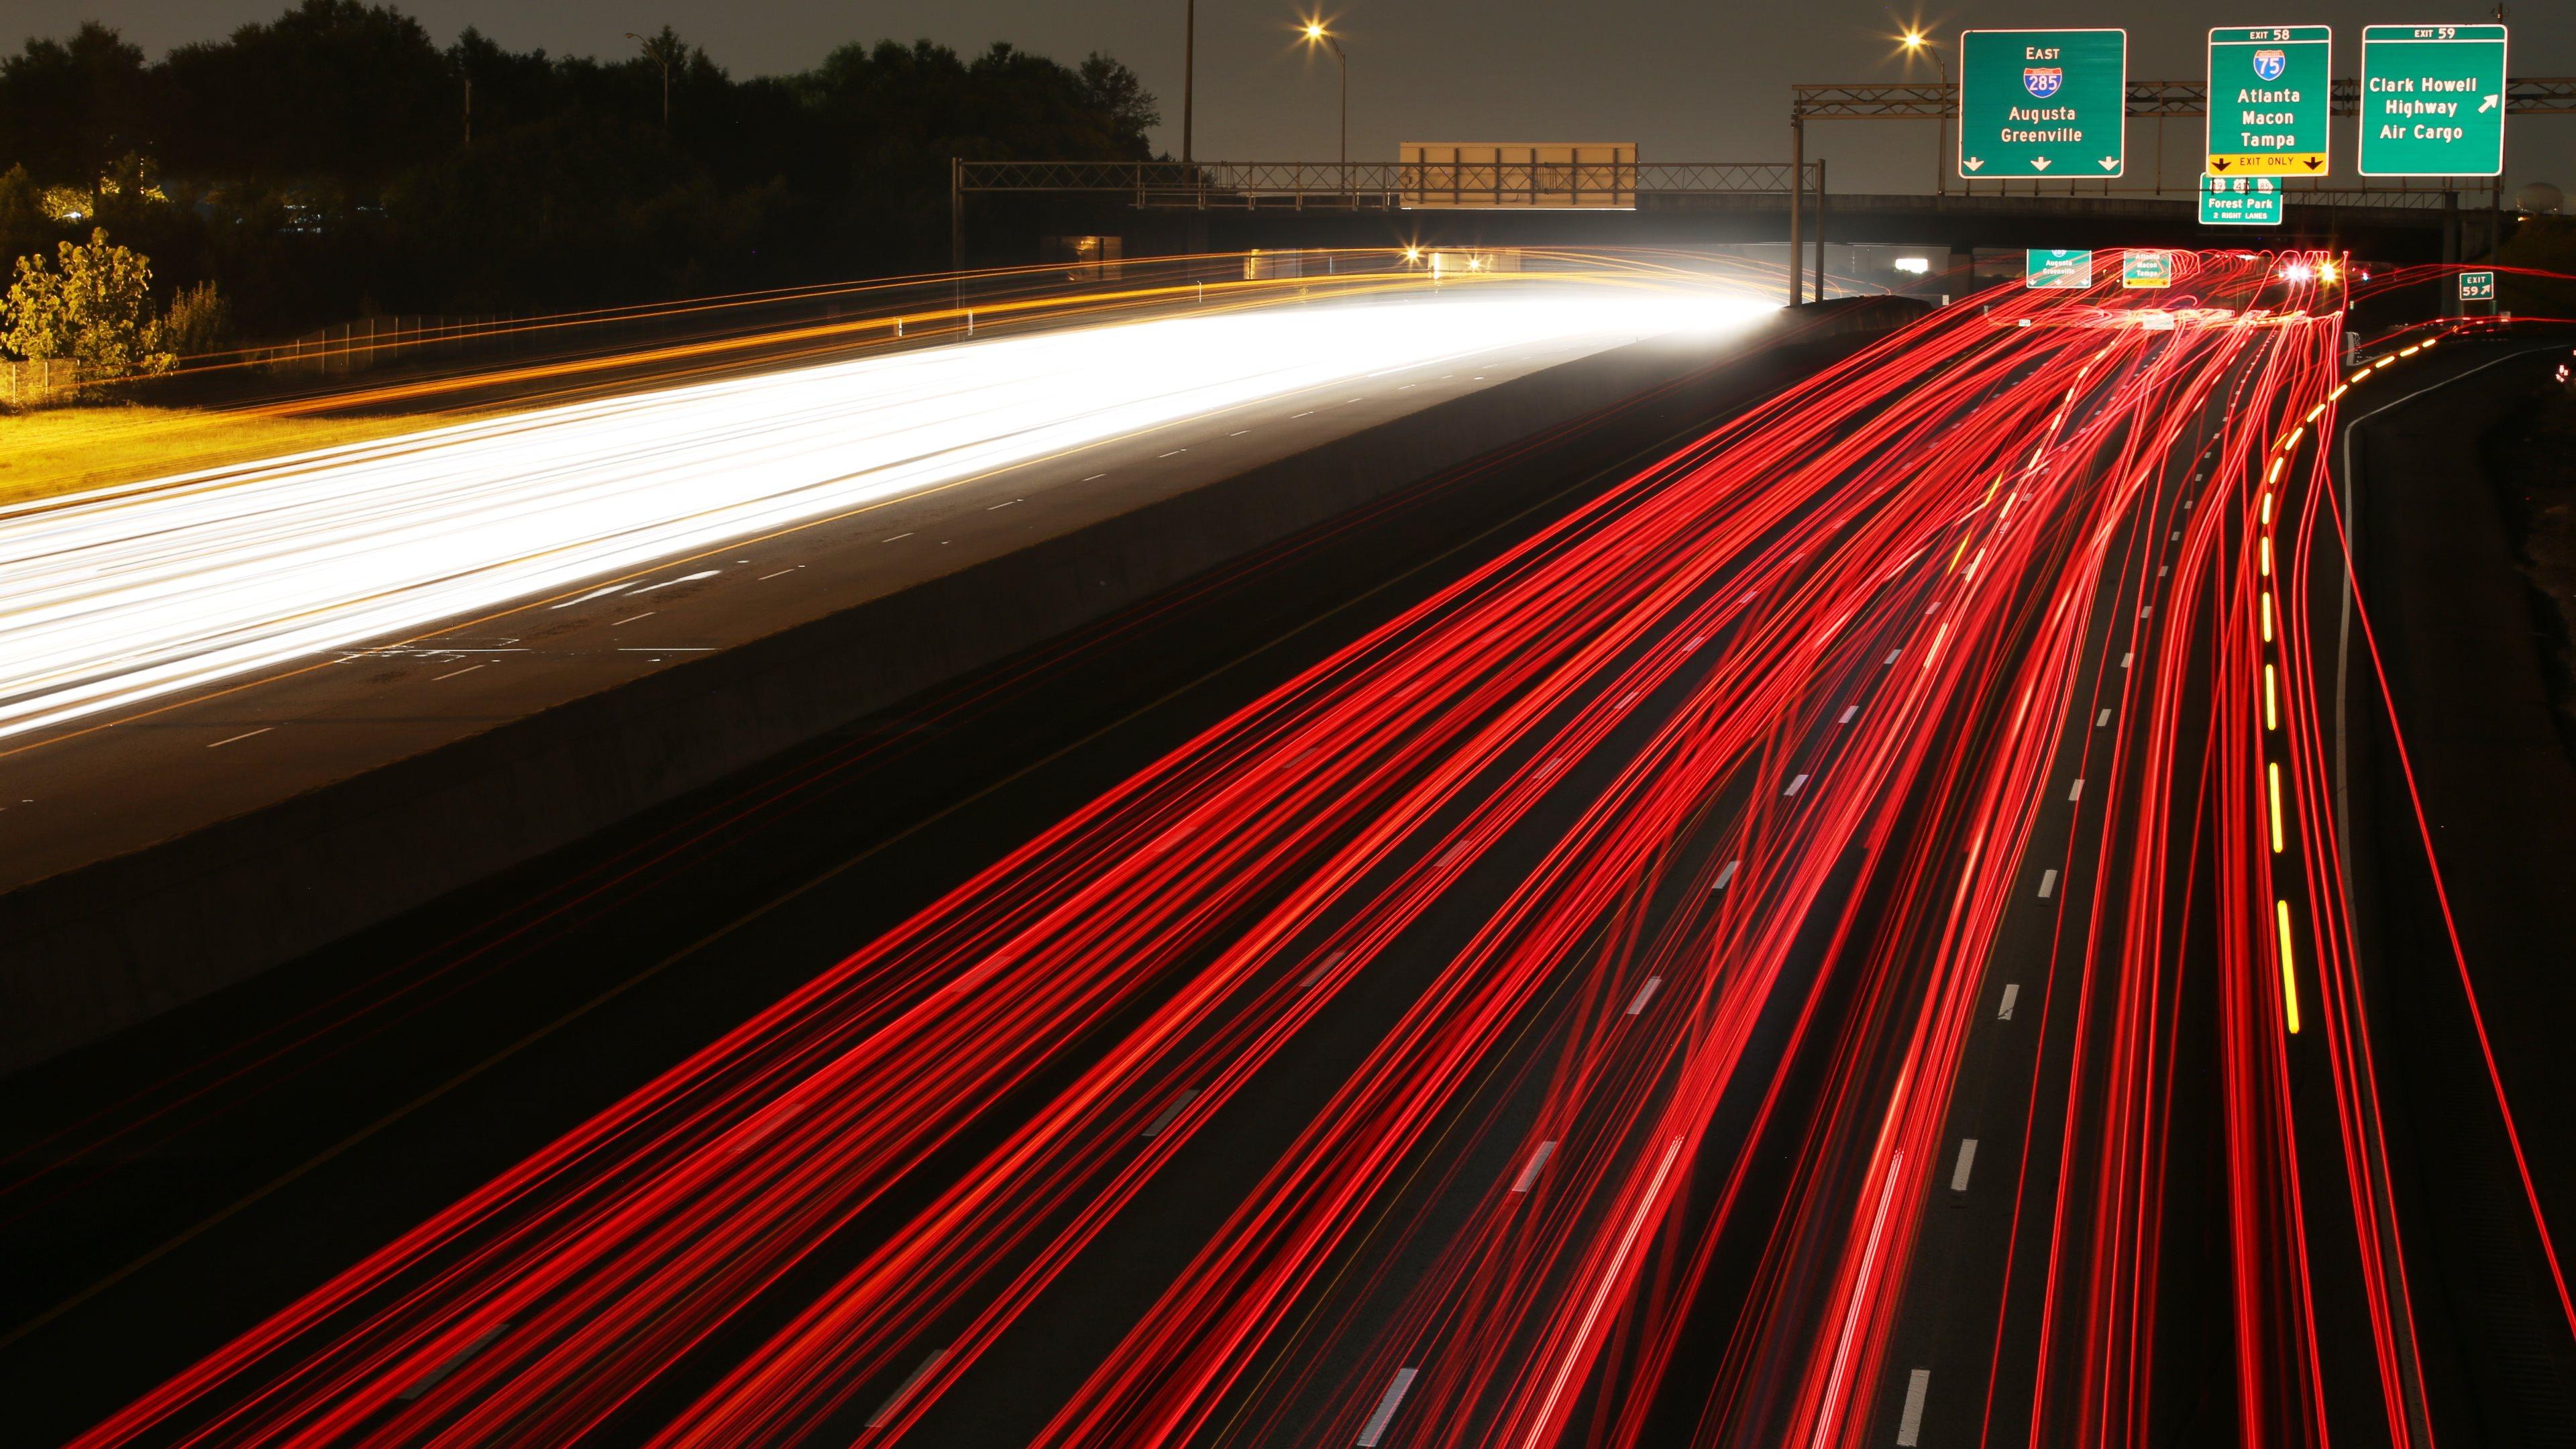 Cars Highways Long Exposure Motion Blur Night Time Traffic Lights ...